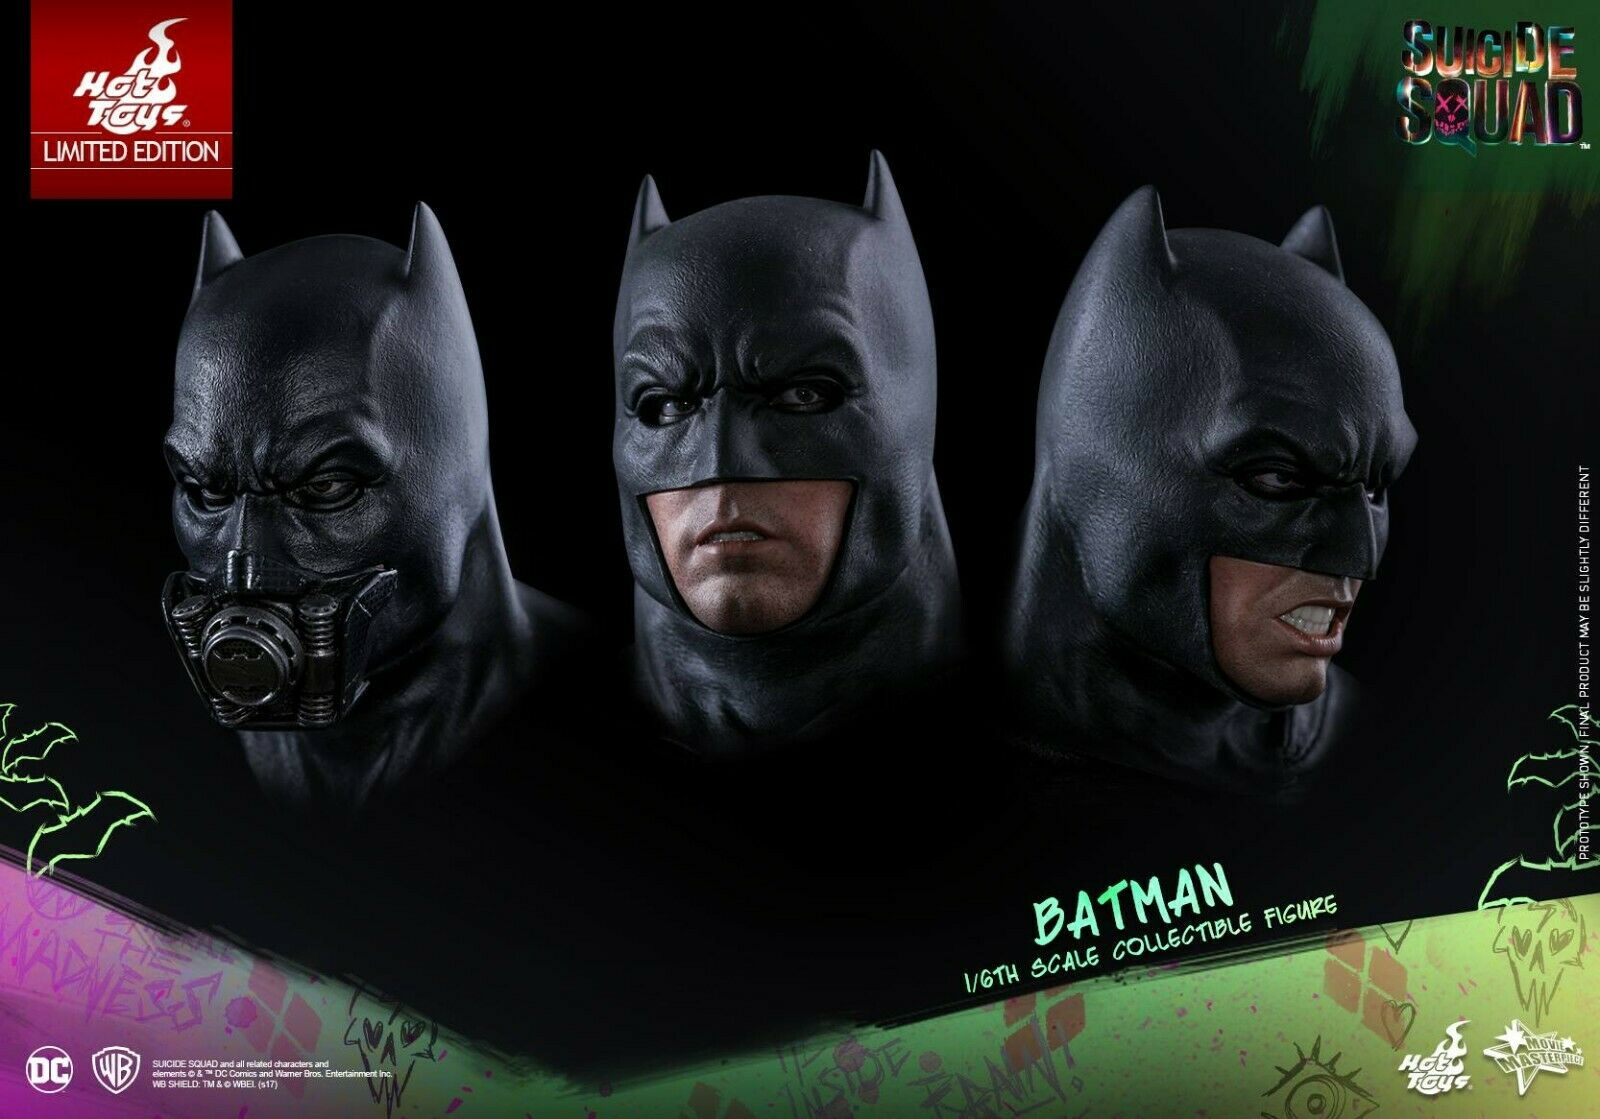 Hot Toys Batman SUICIDE SQUAD MMS 409 1 6 schaal GRATIS scheepvaart